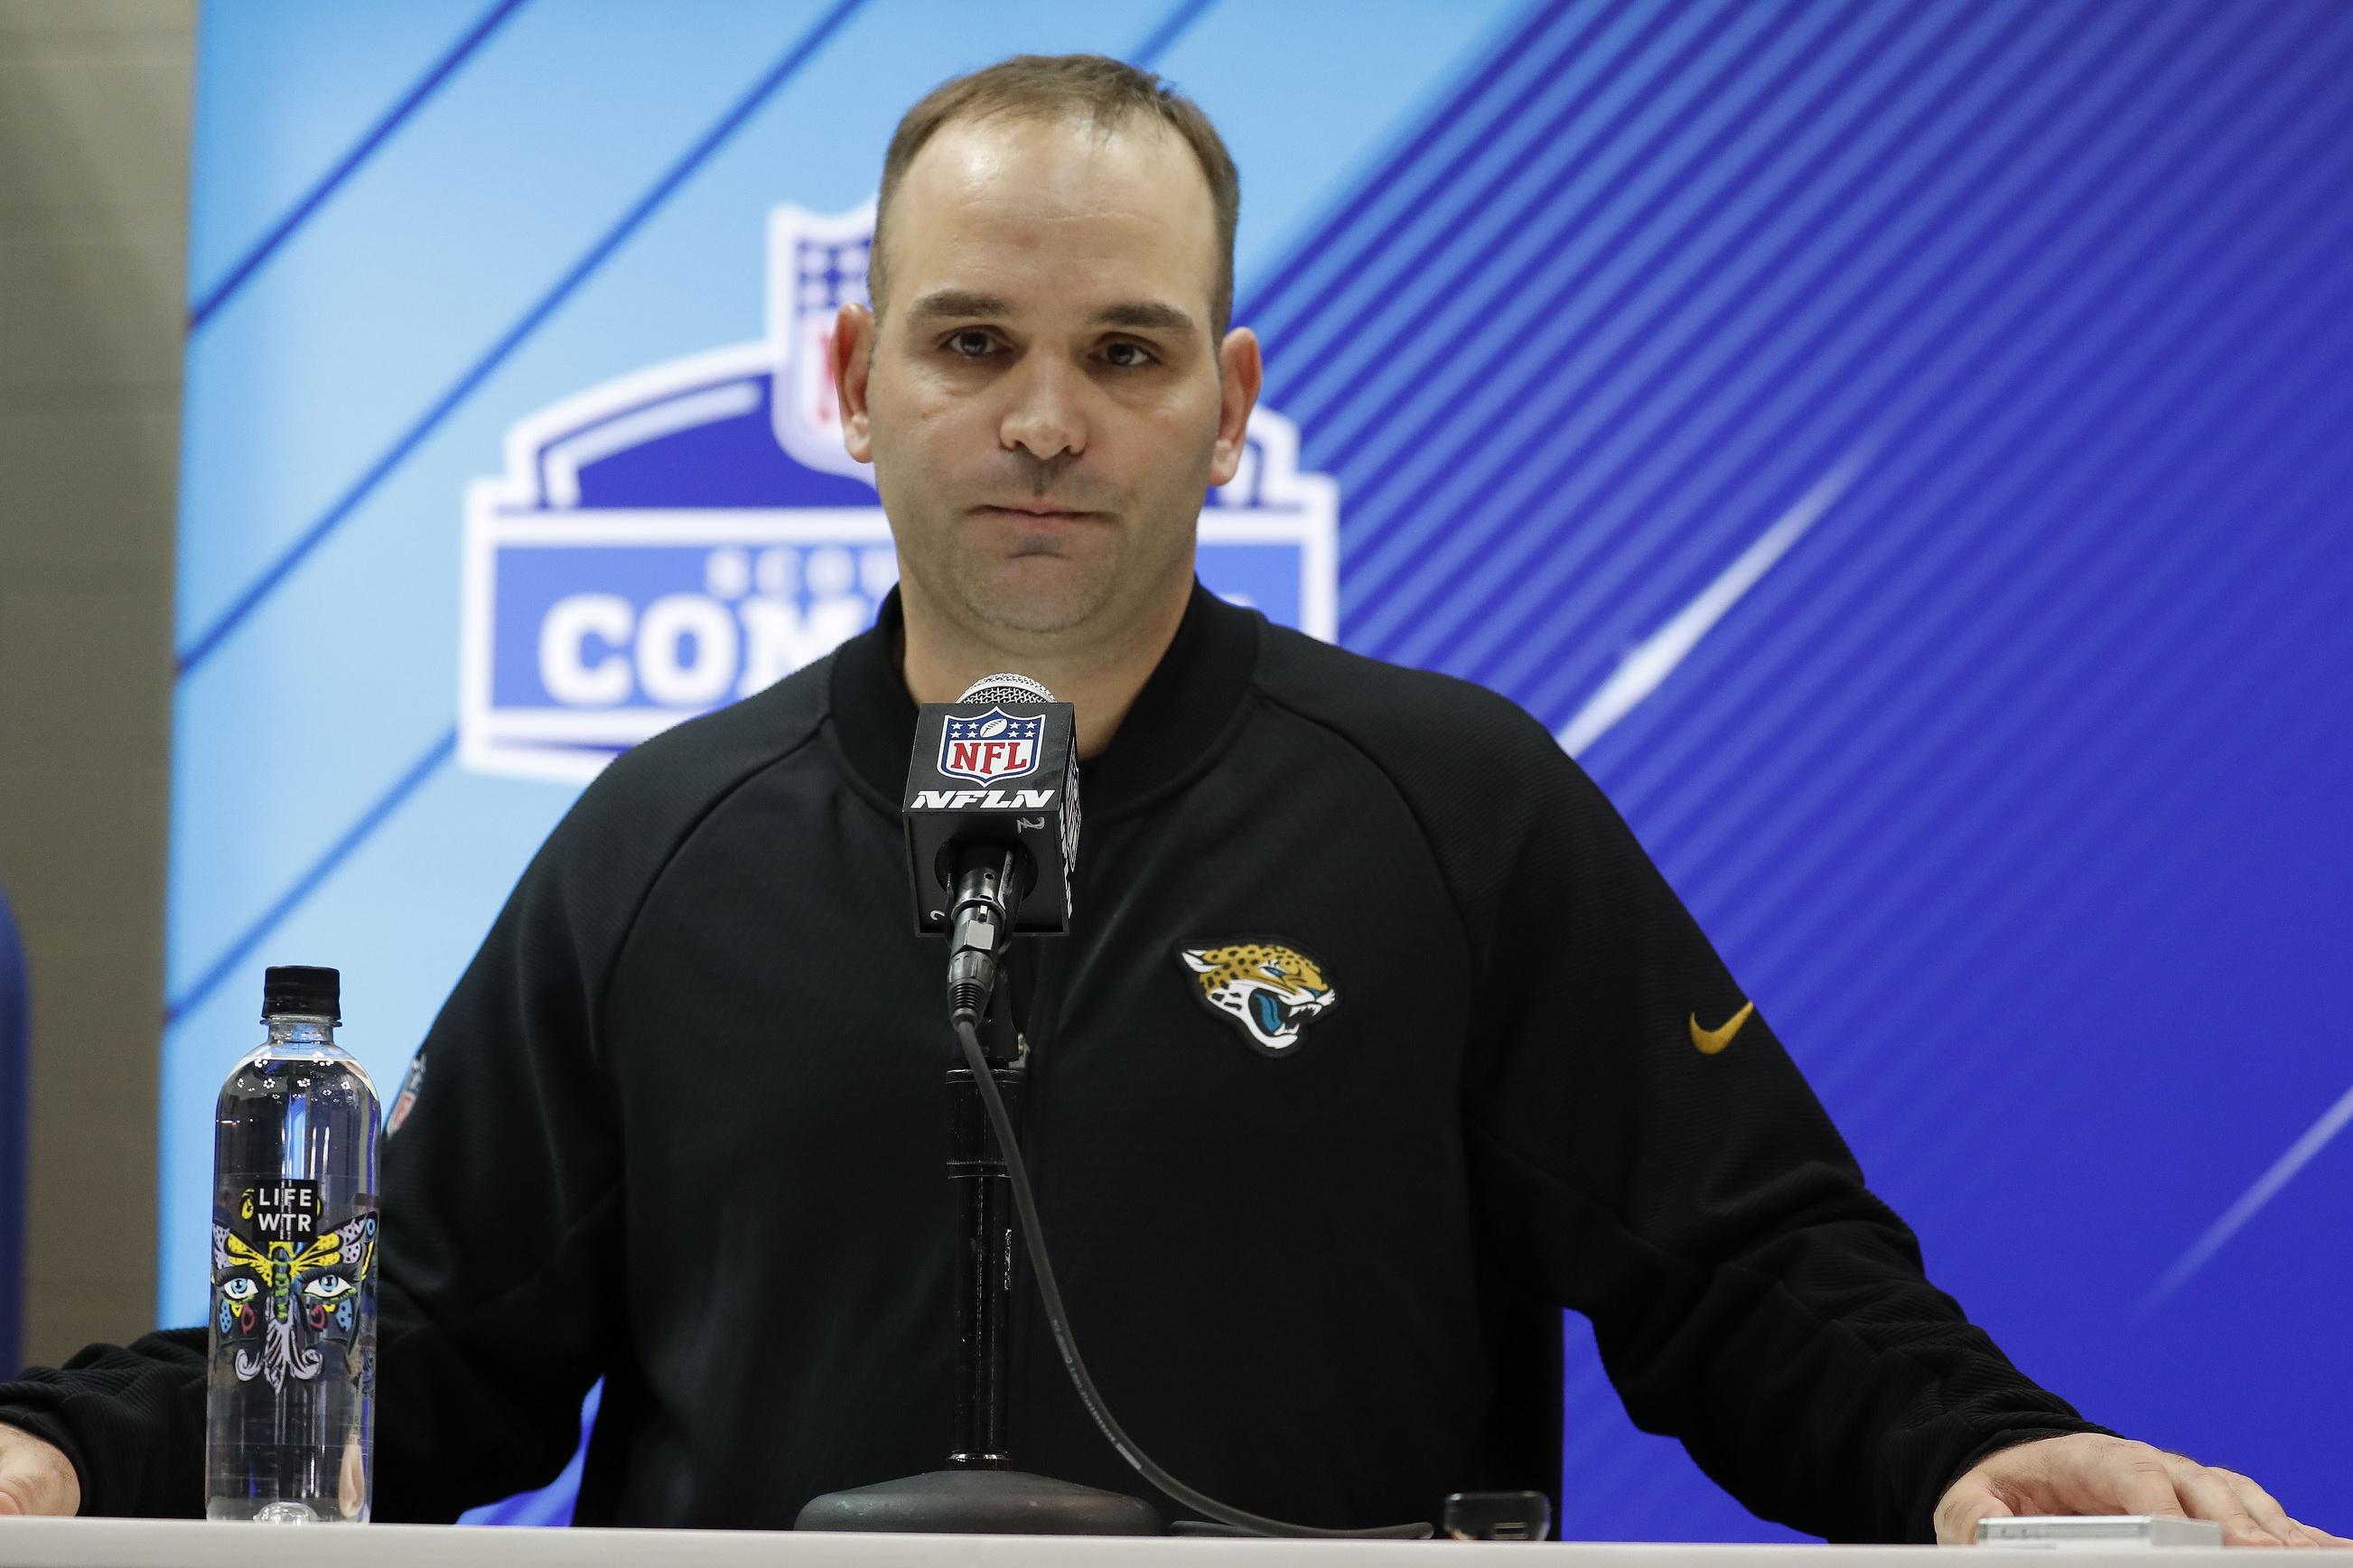 Jaguars news: Team fires general manager Dave Caldwell